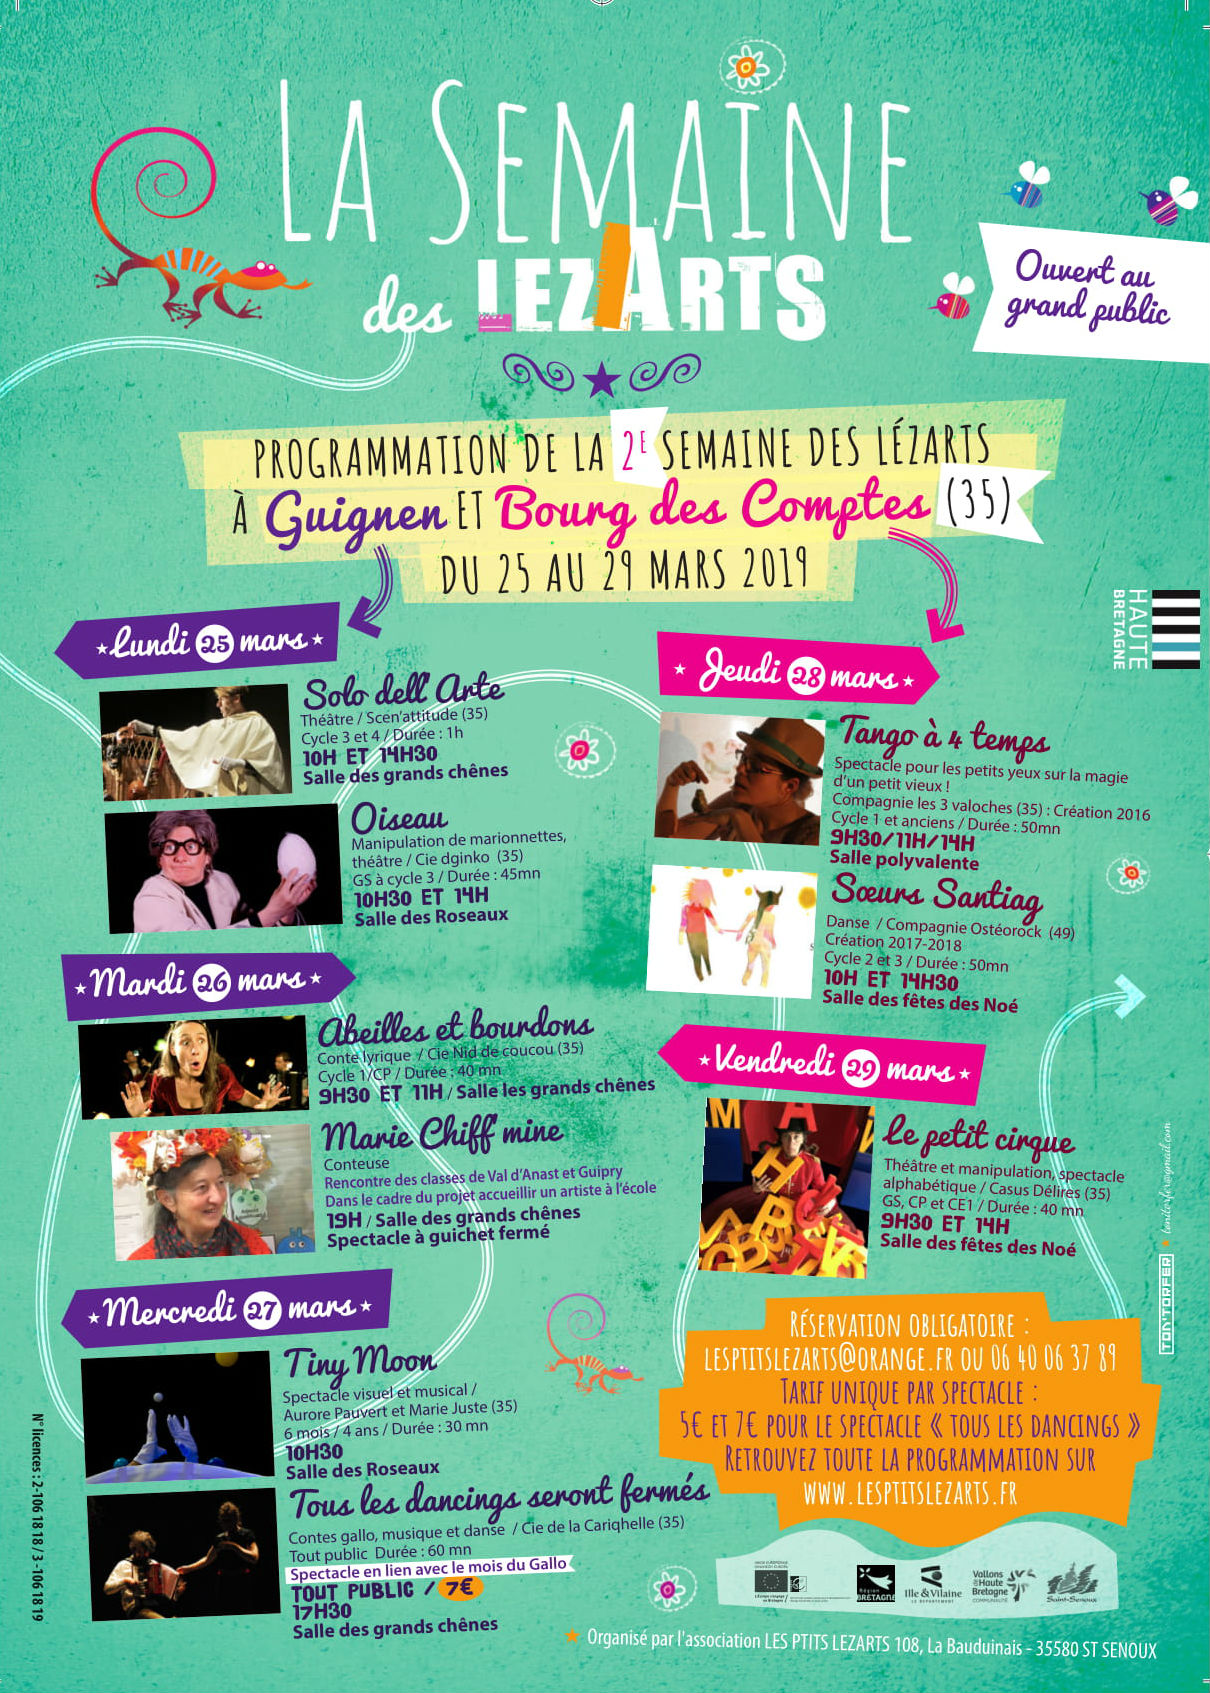 semaine-des-lezarts-2019-flyer-programme